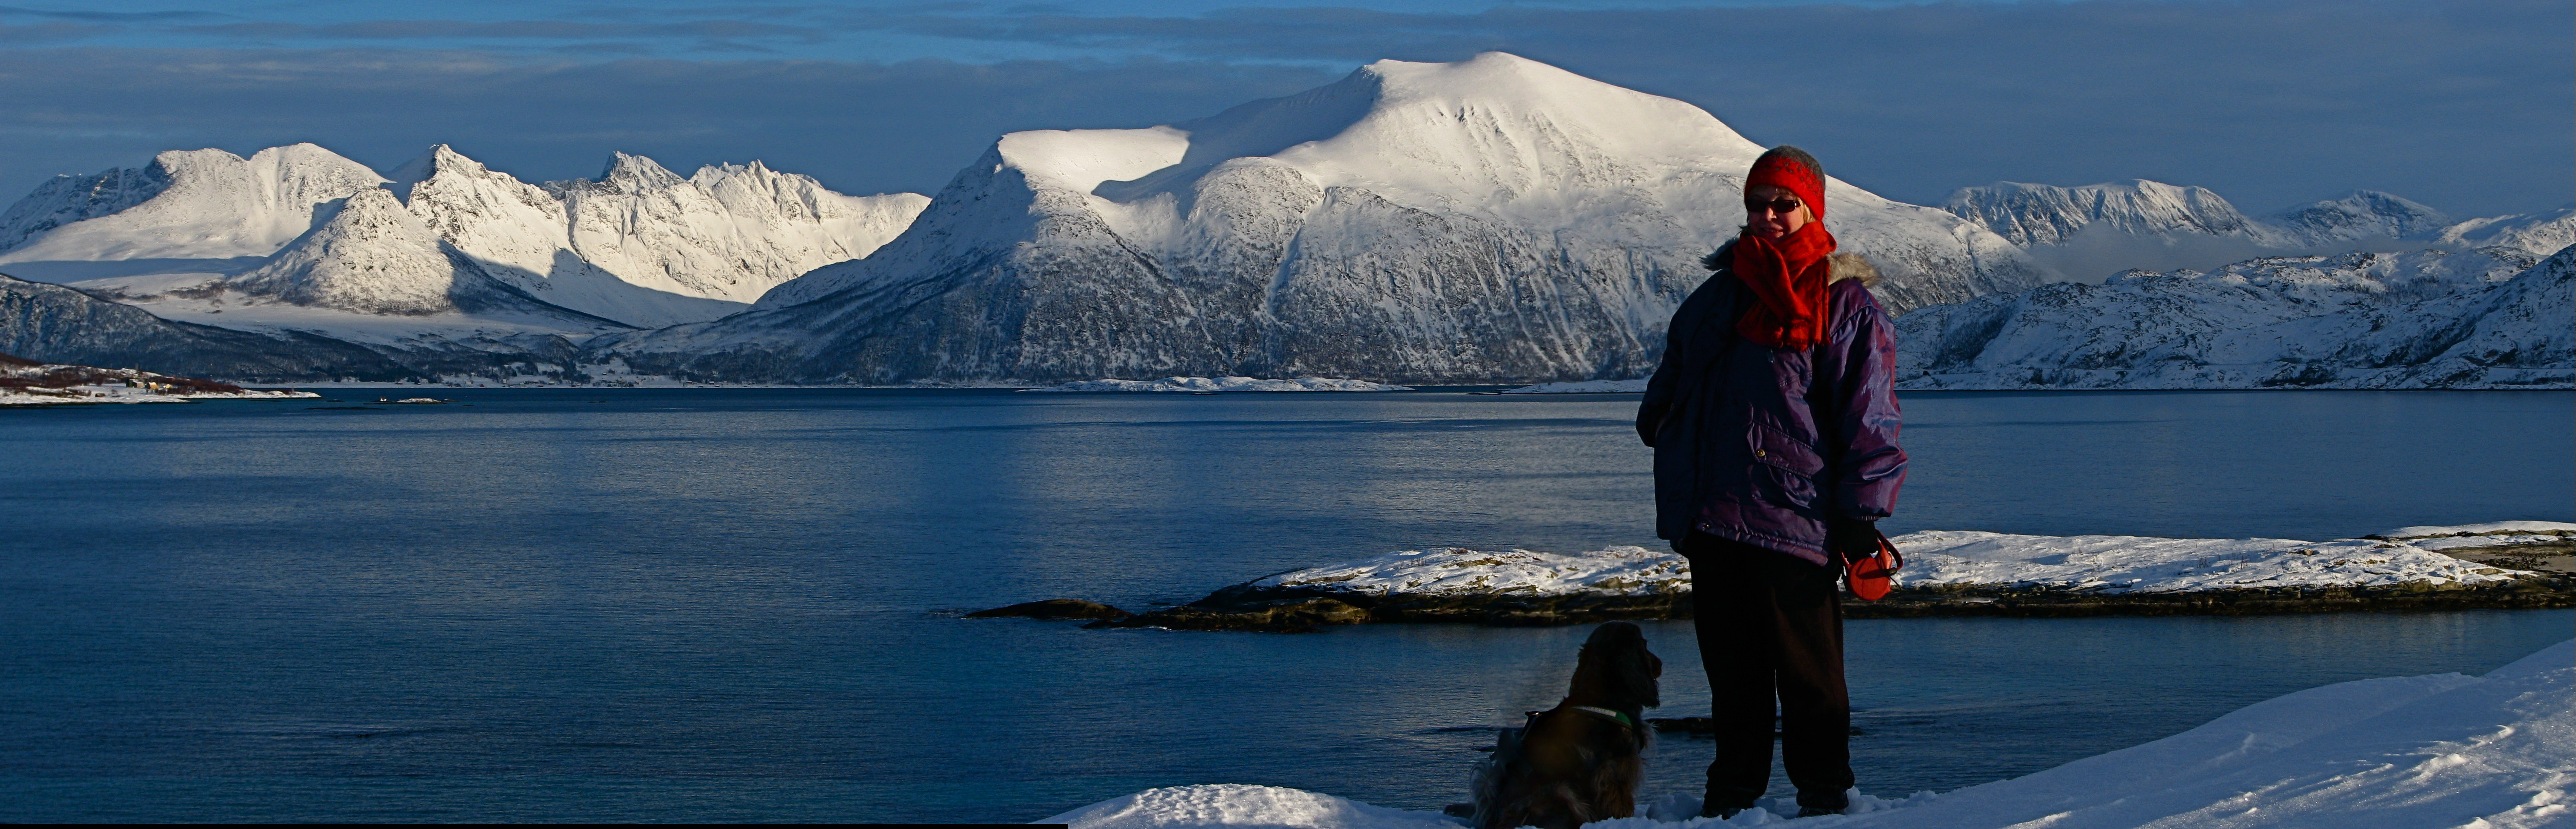 Sommarøya05.JPG